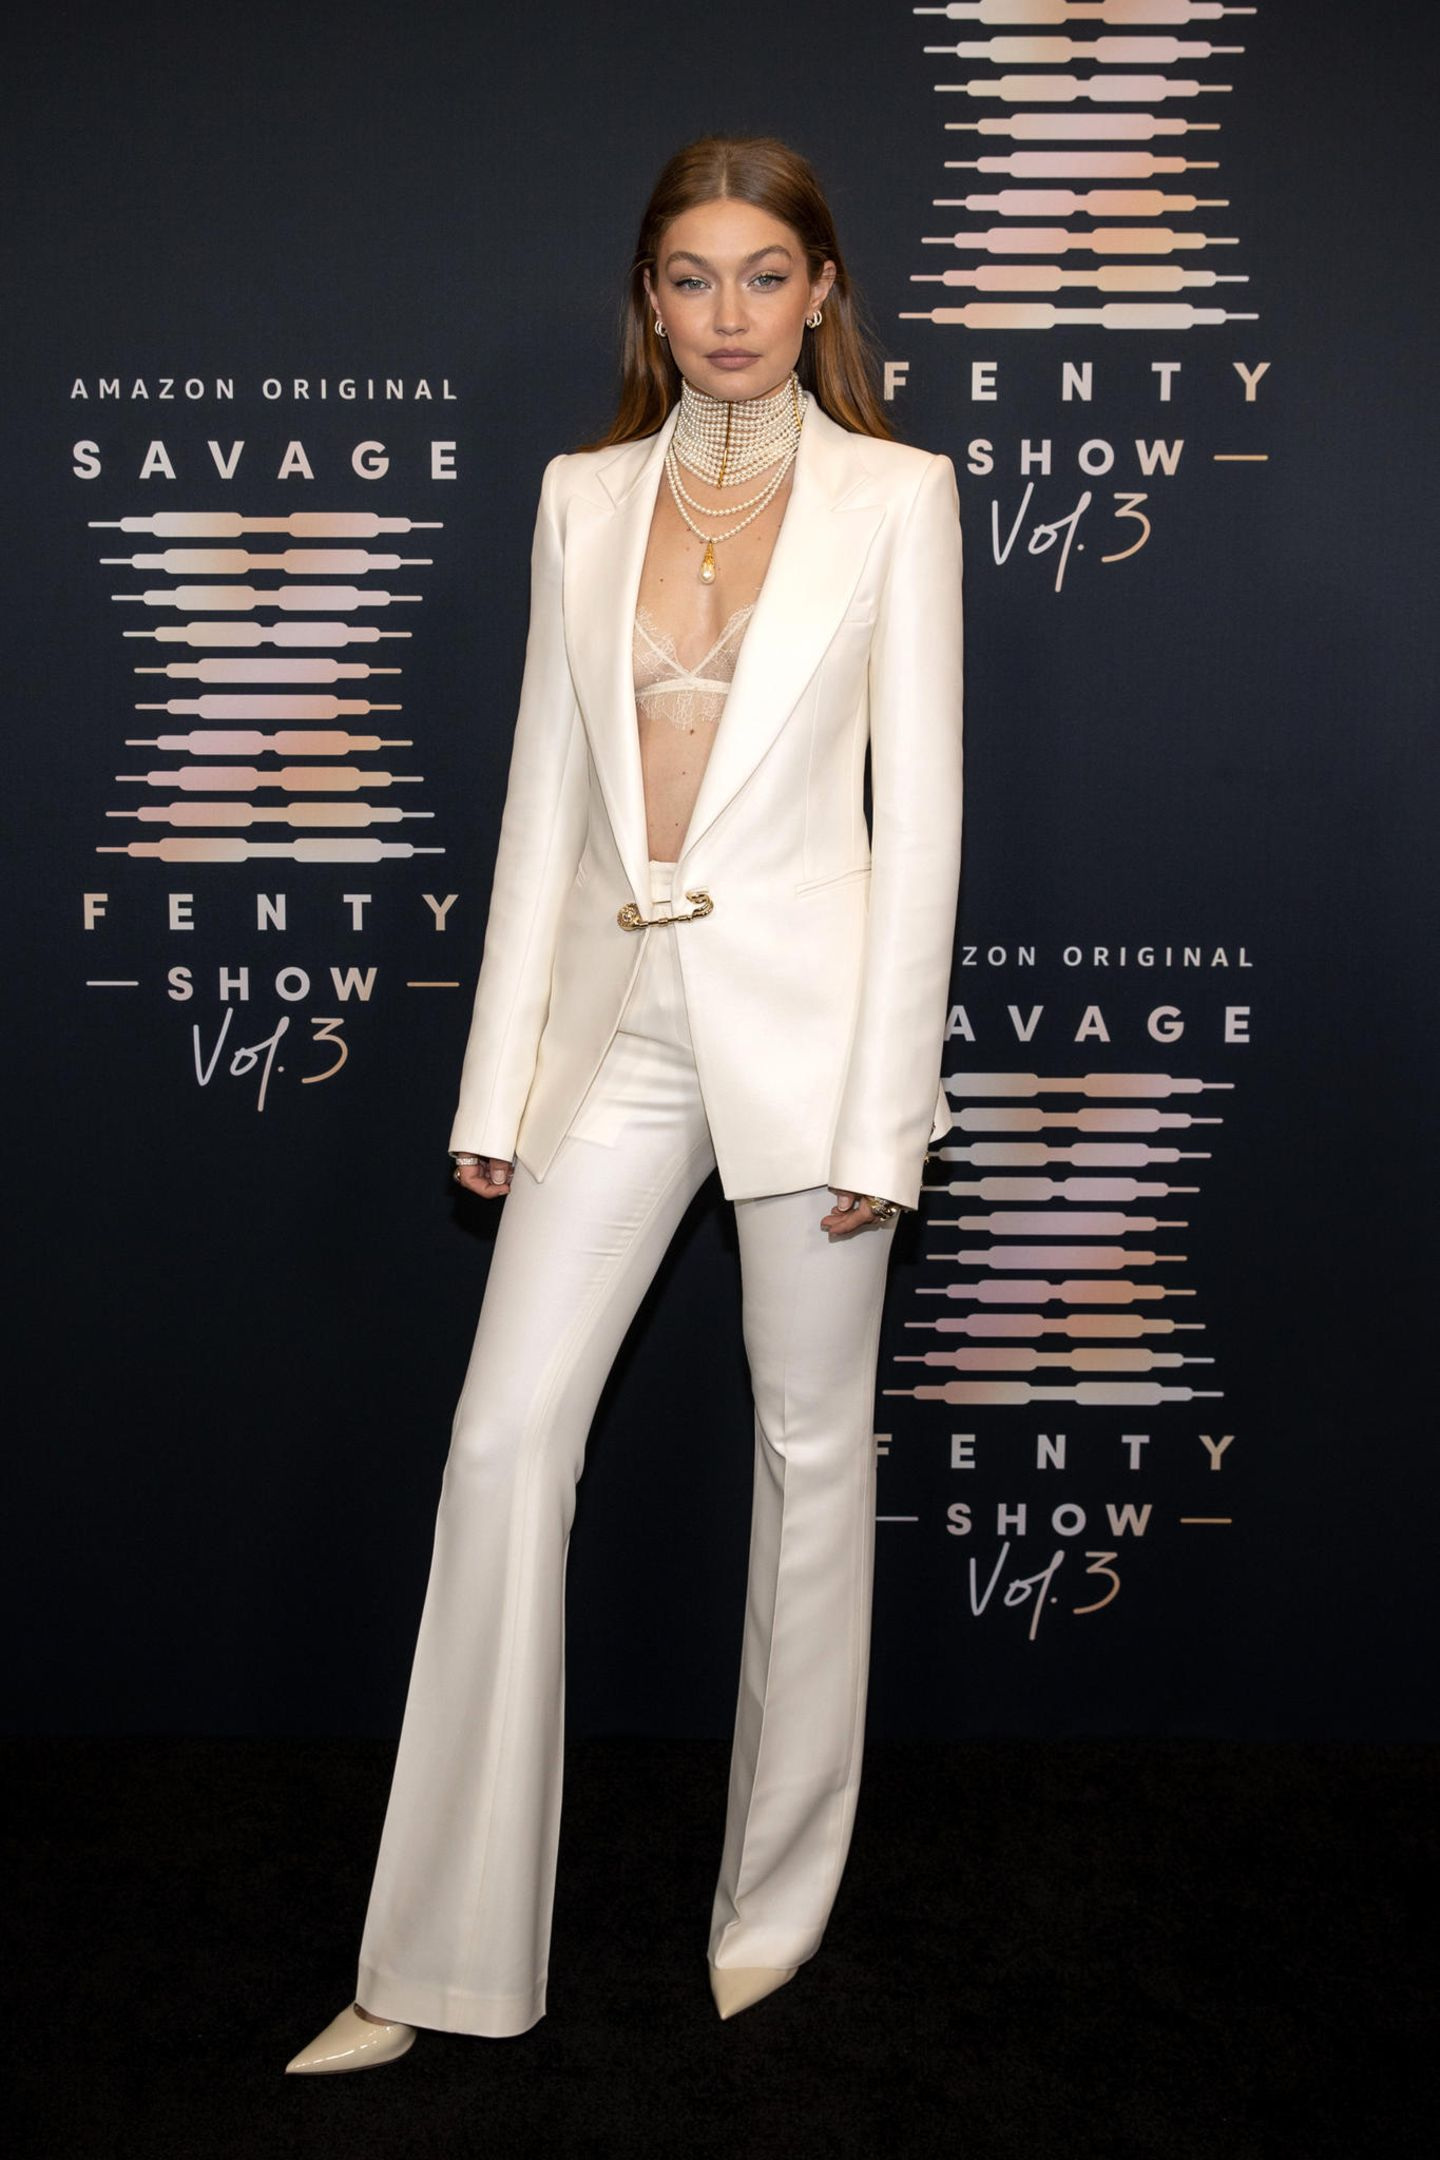 Gigi Hadid besucht Rihannas Lingerie-Event